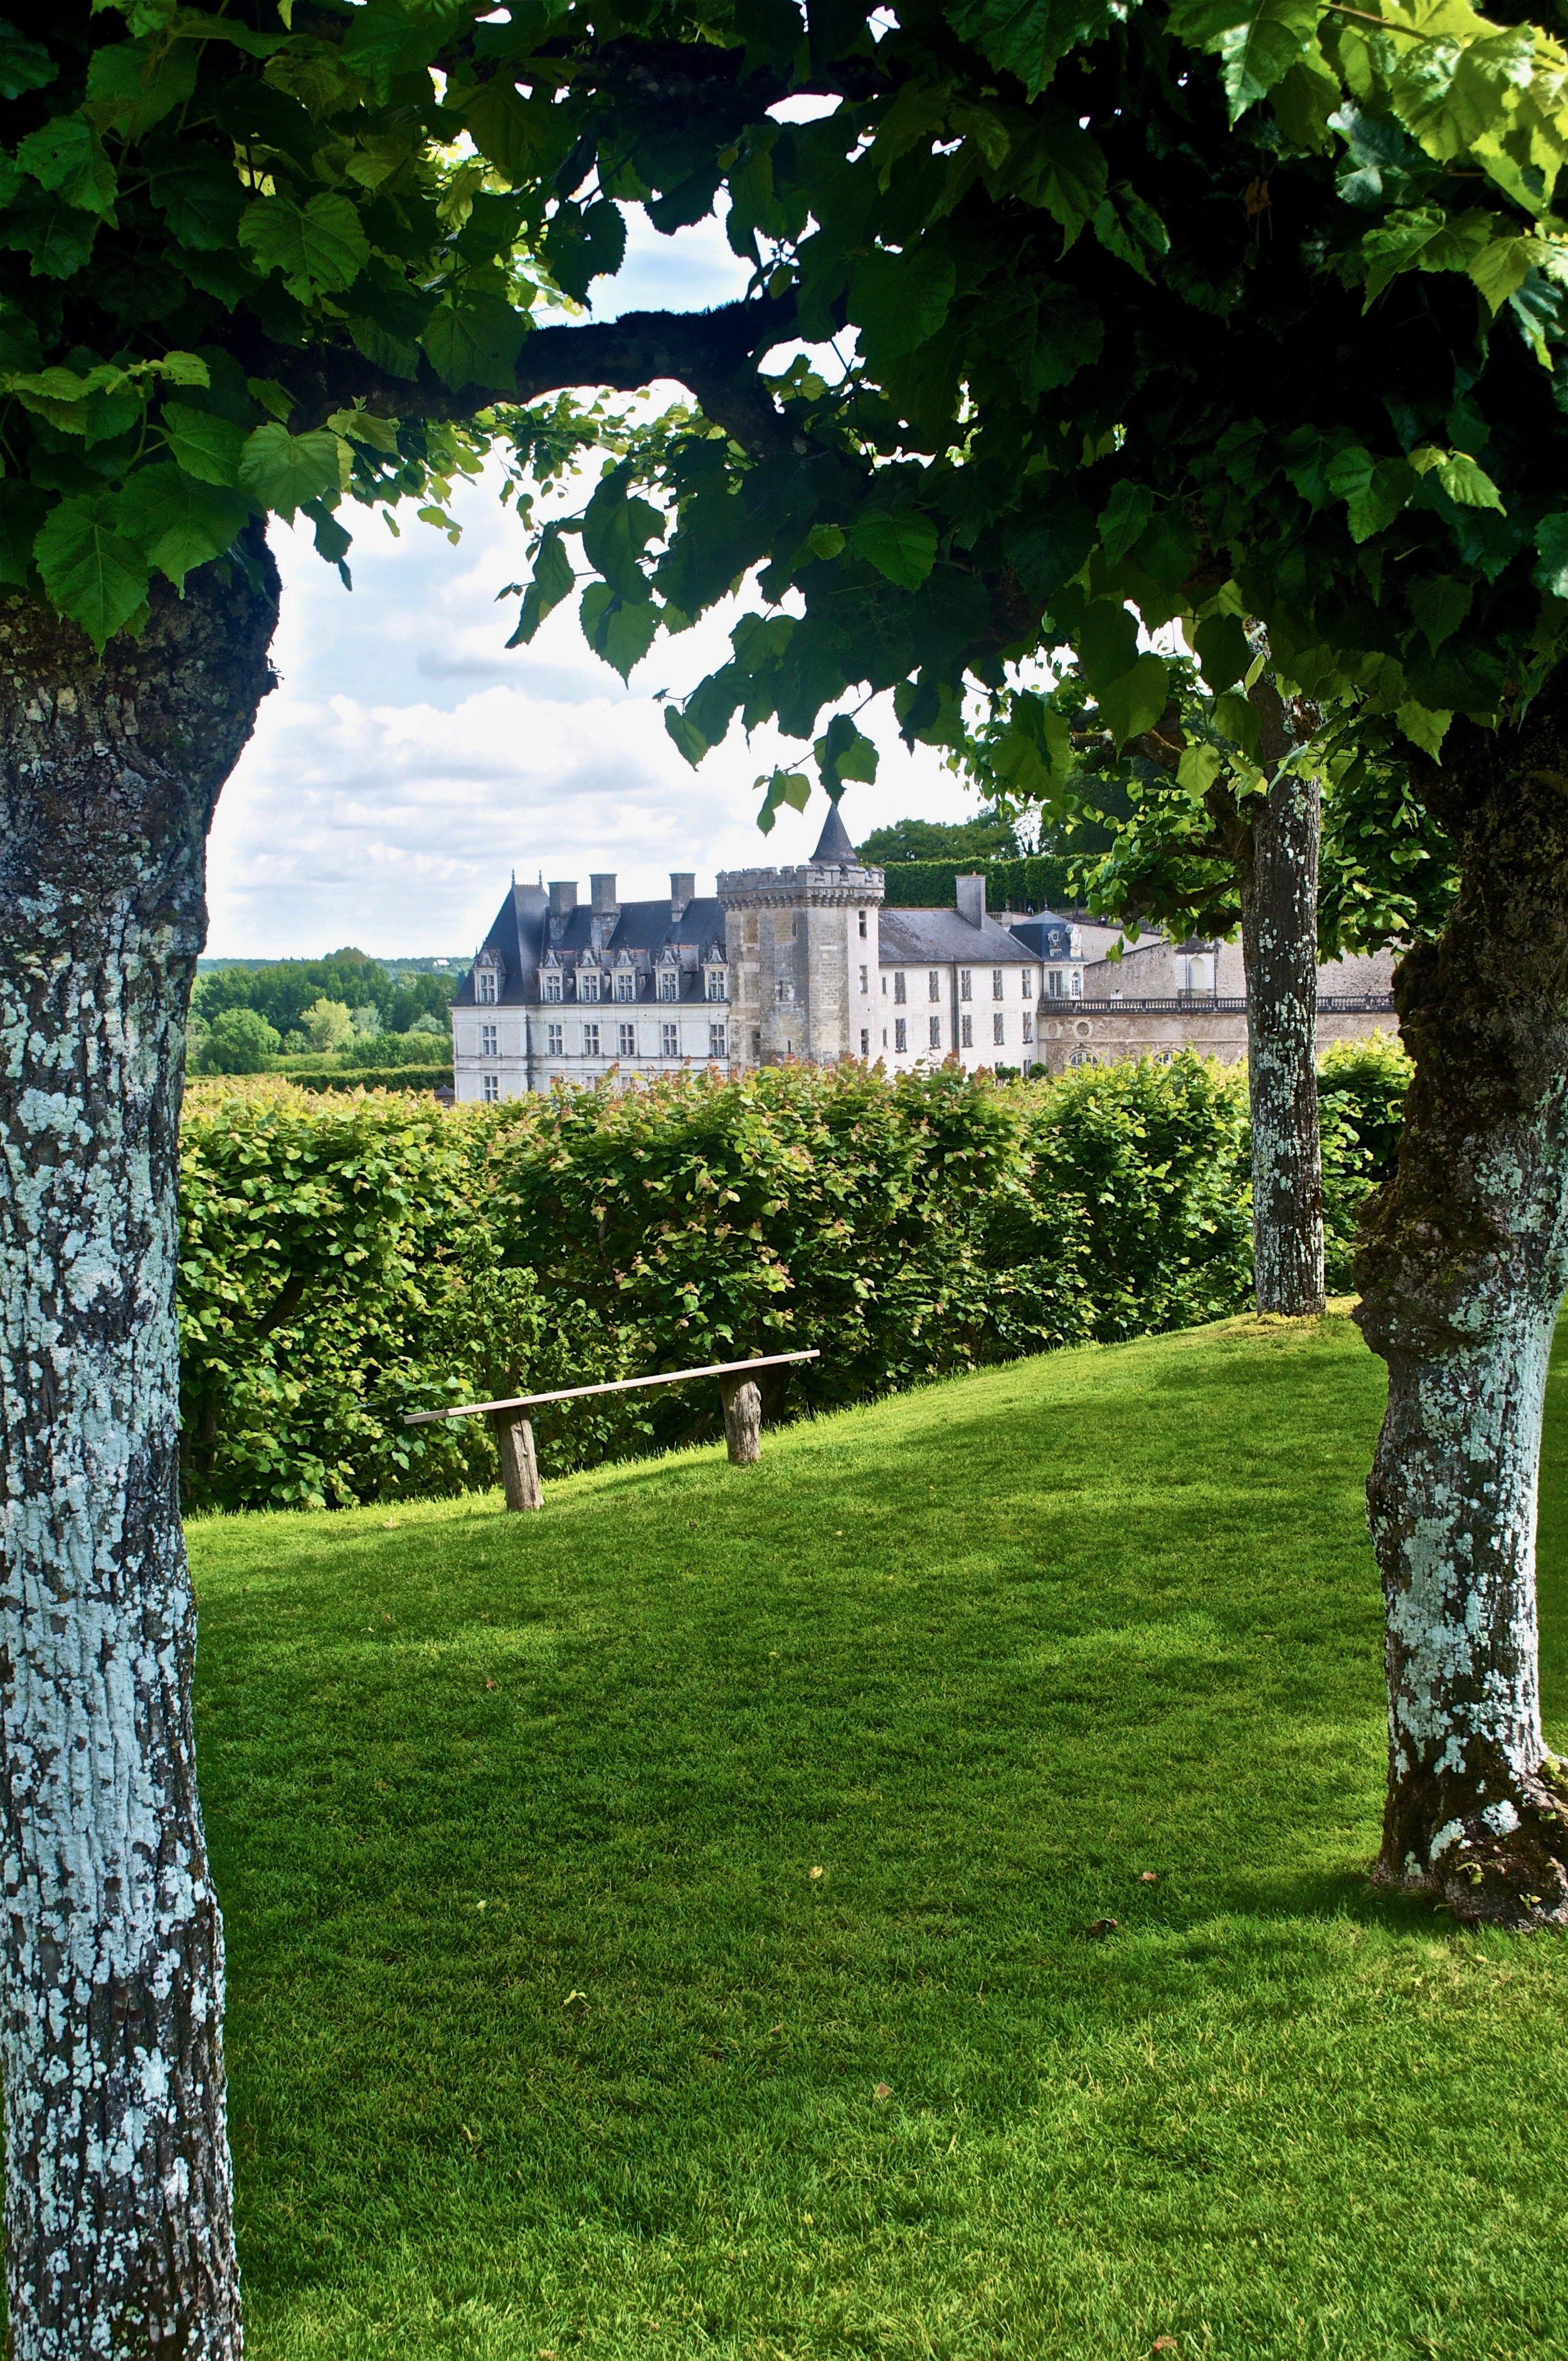 Villandry Chateau - 5 Most Magnificent Castles of the Loire Valley - A Happy Passport #chateau #castle #france #villandry